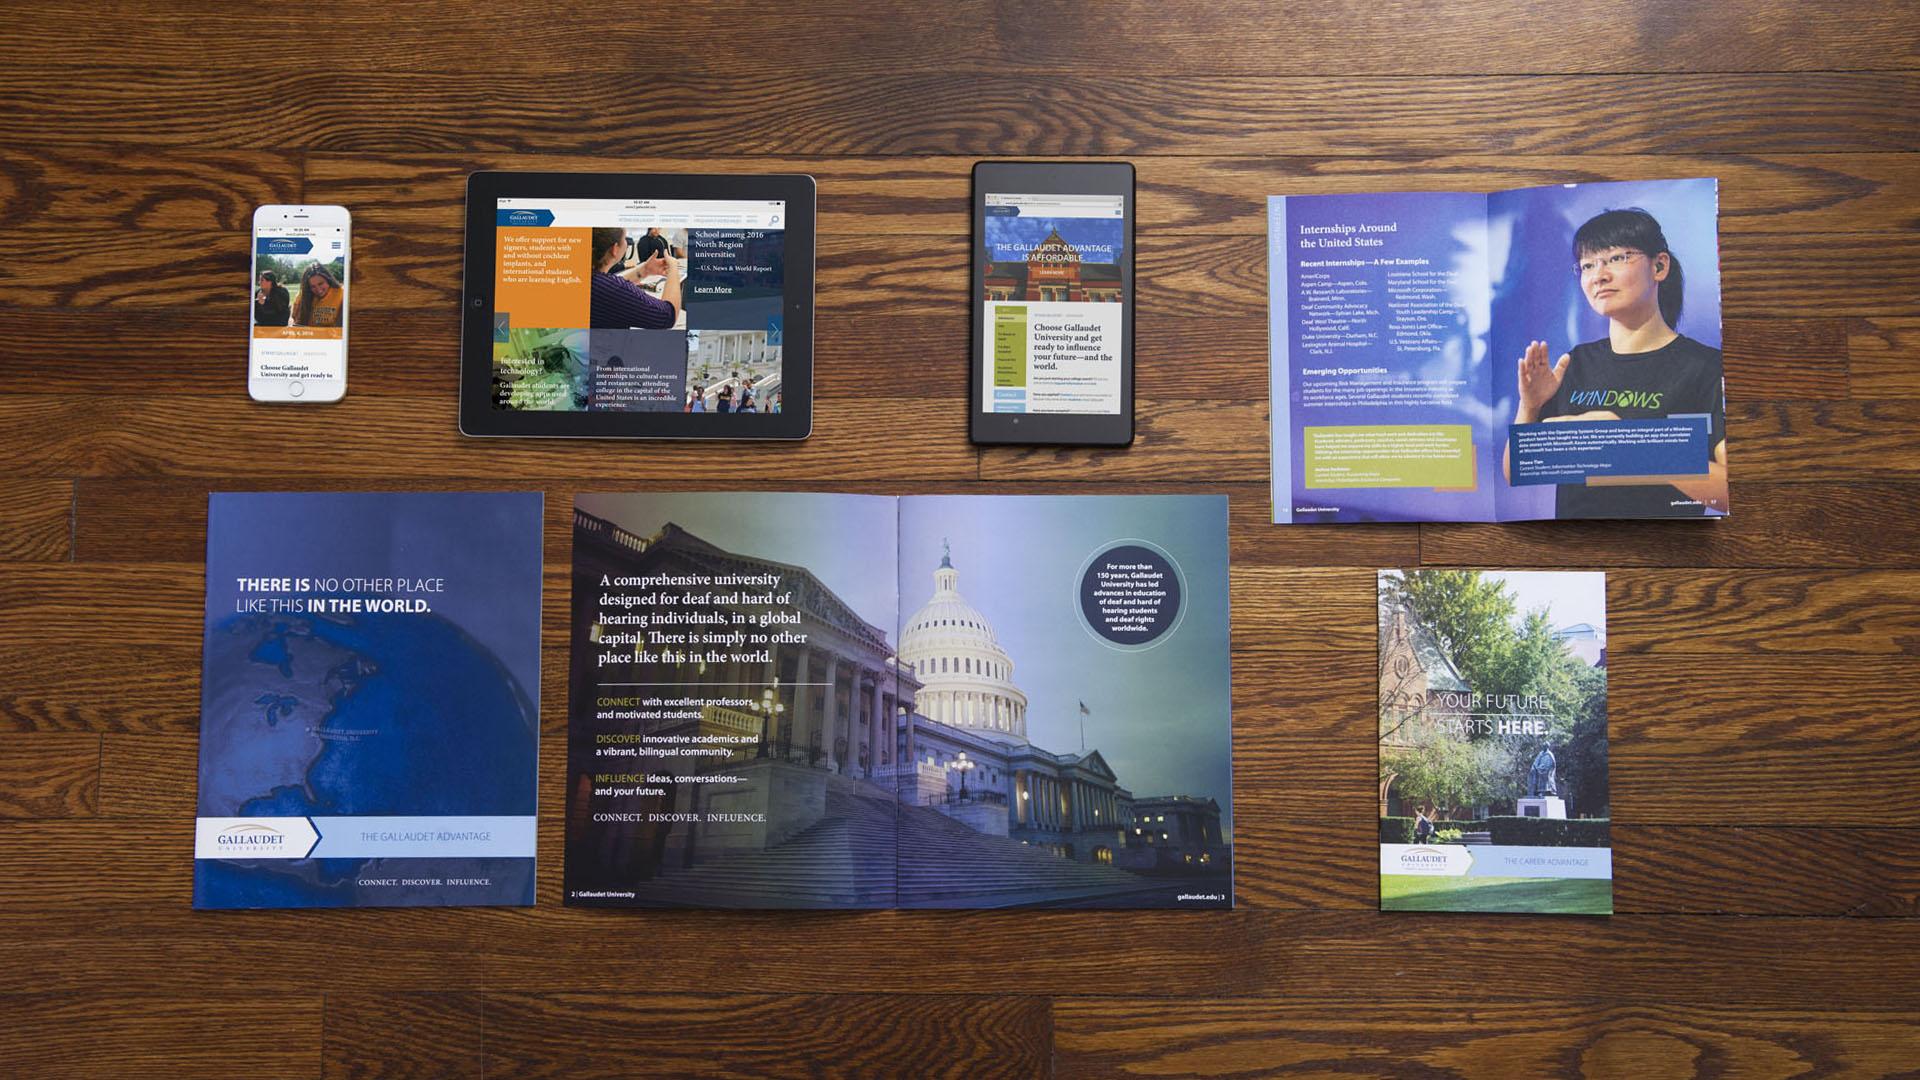 Gallaudet-University-Branding-Marketing-Admissions-Viewbook_01.jpg